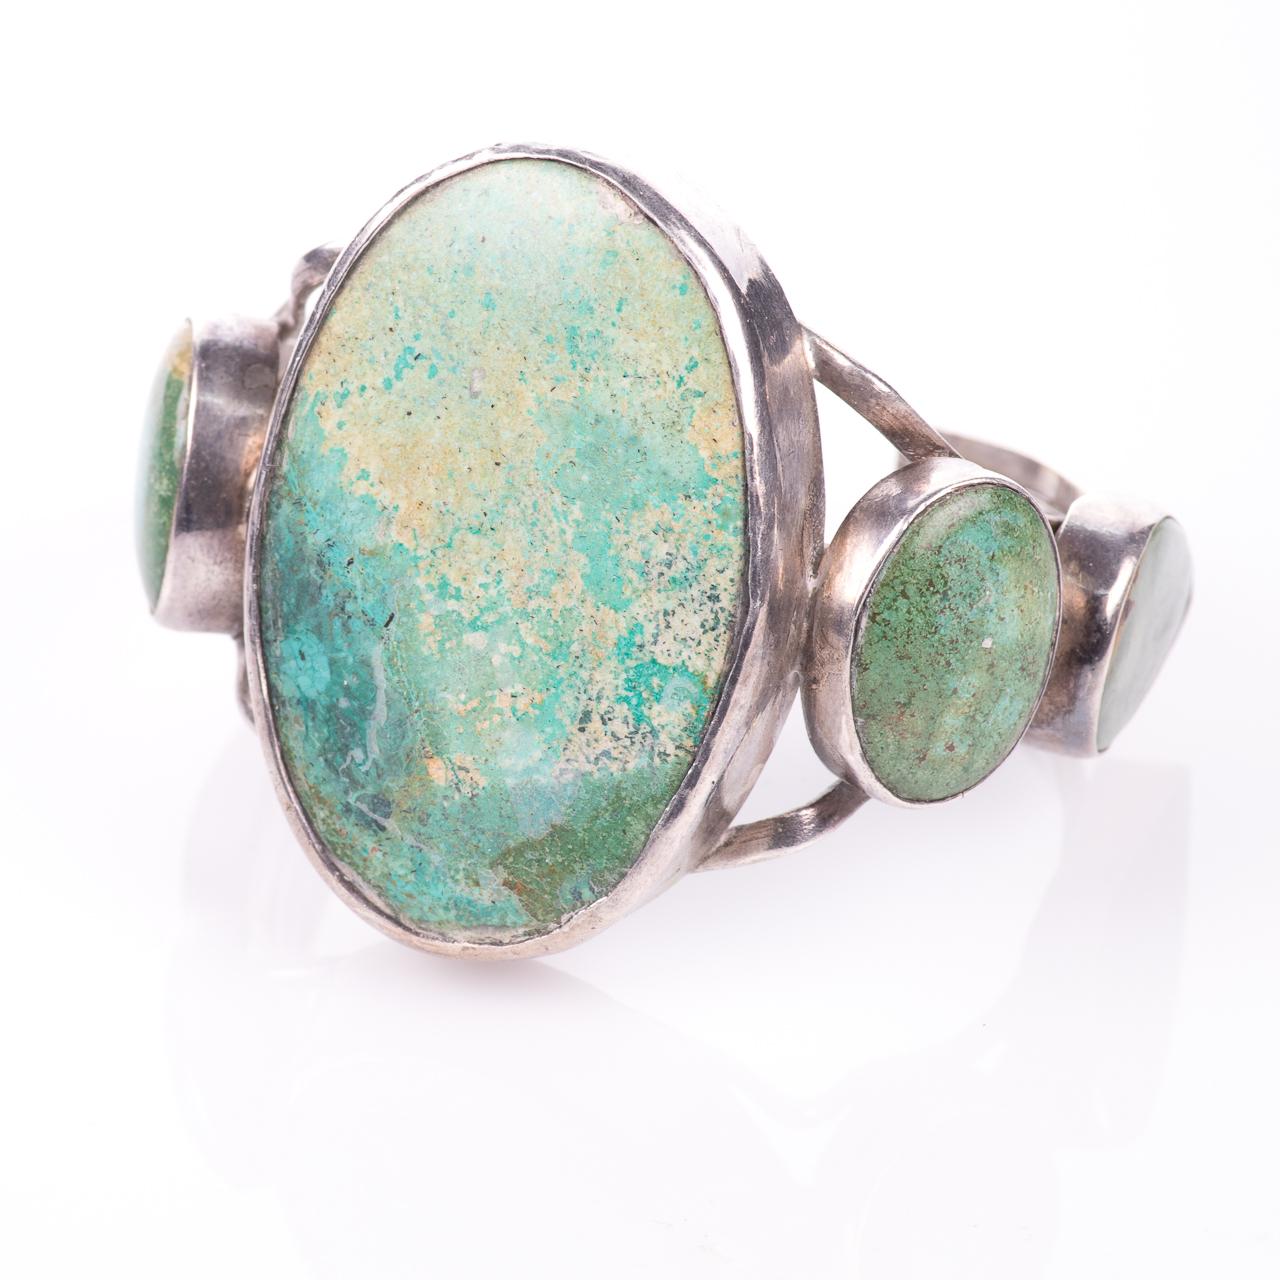 White Metal Navajo Turquoise Bangle - Image 3 of 6